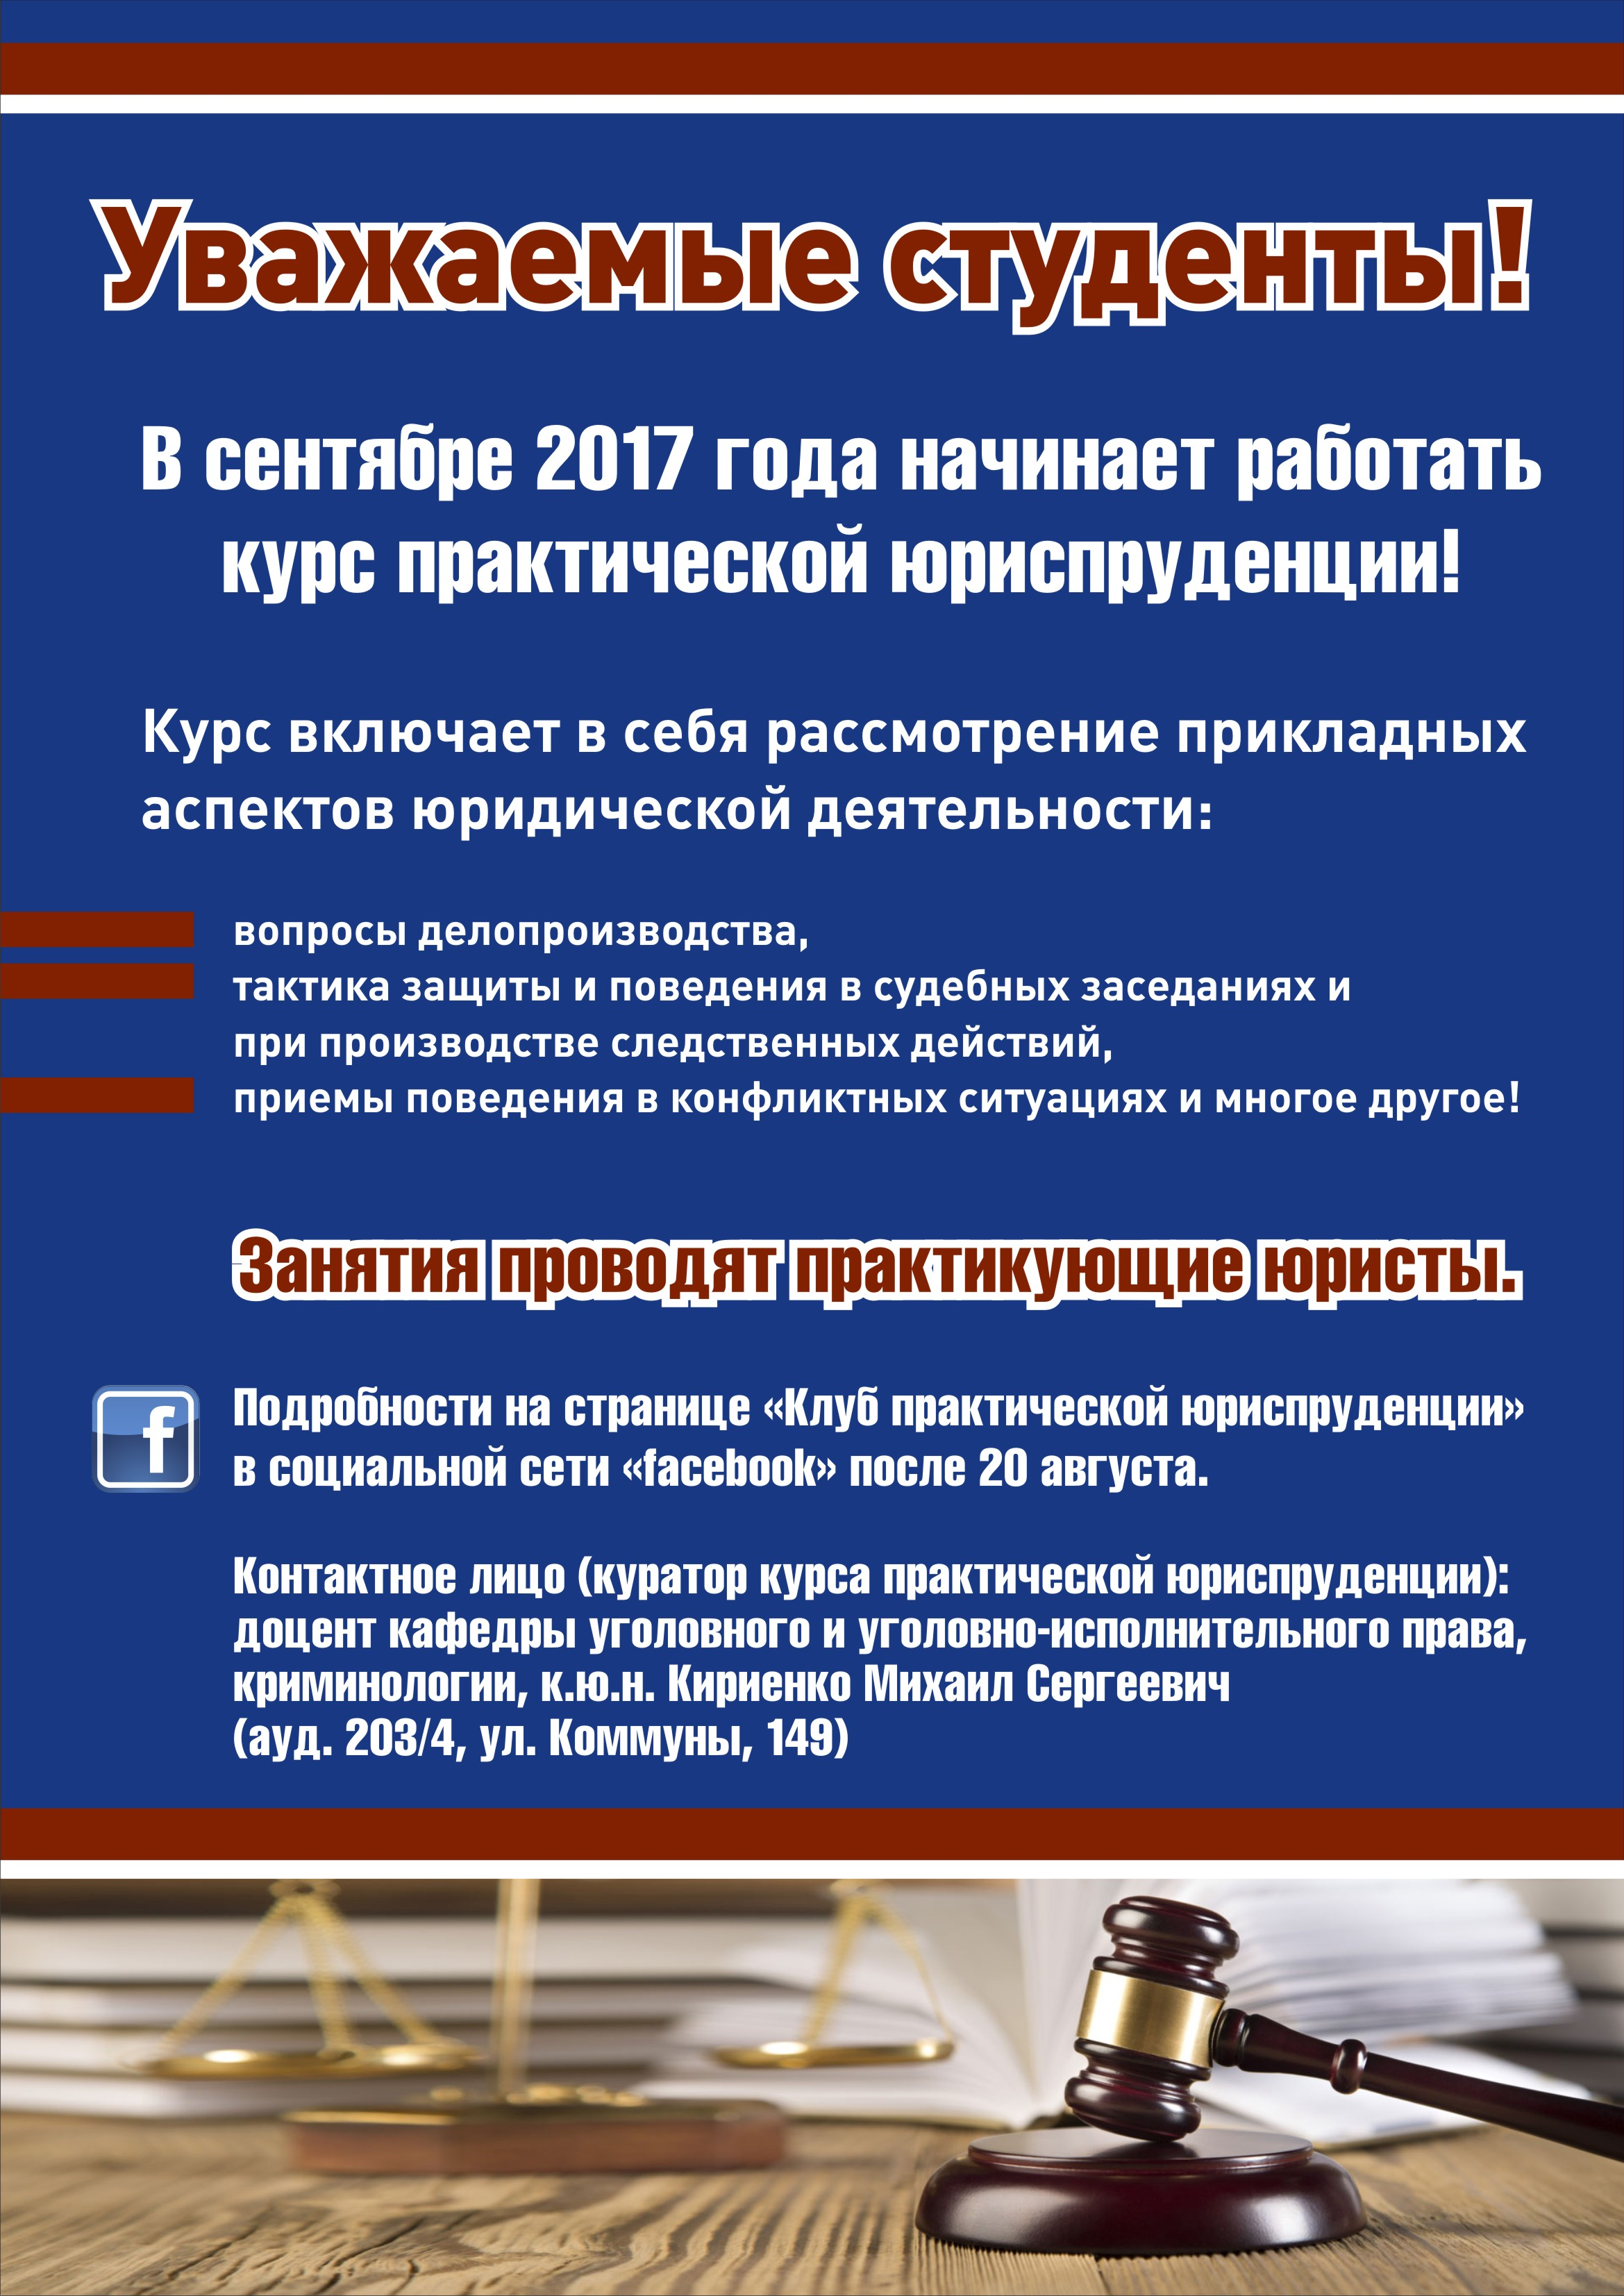 http://law.susu.ru/wp-content/uploads/2017/08/Afisha-A3_2.jpg